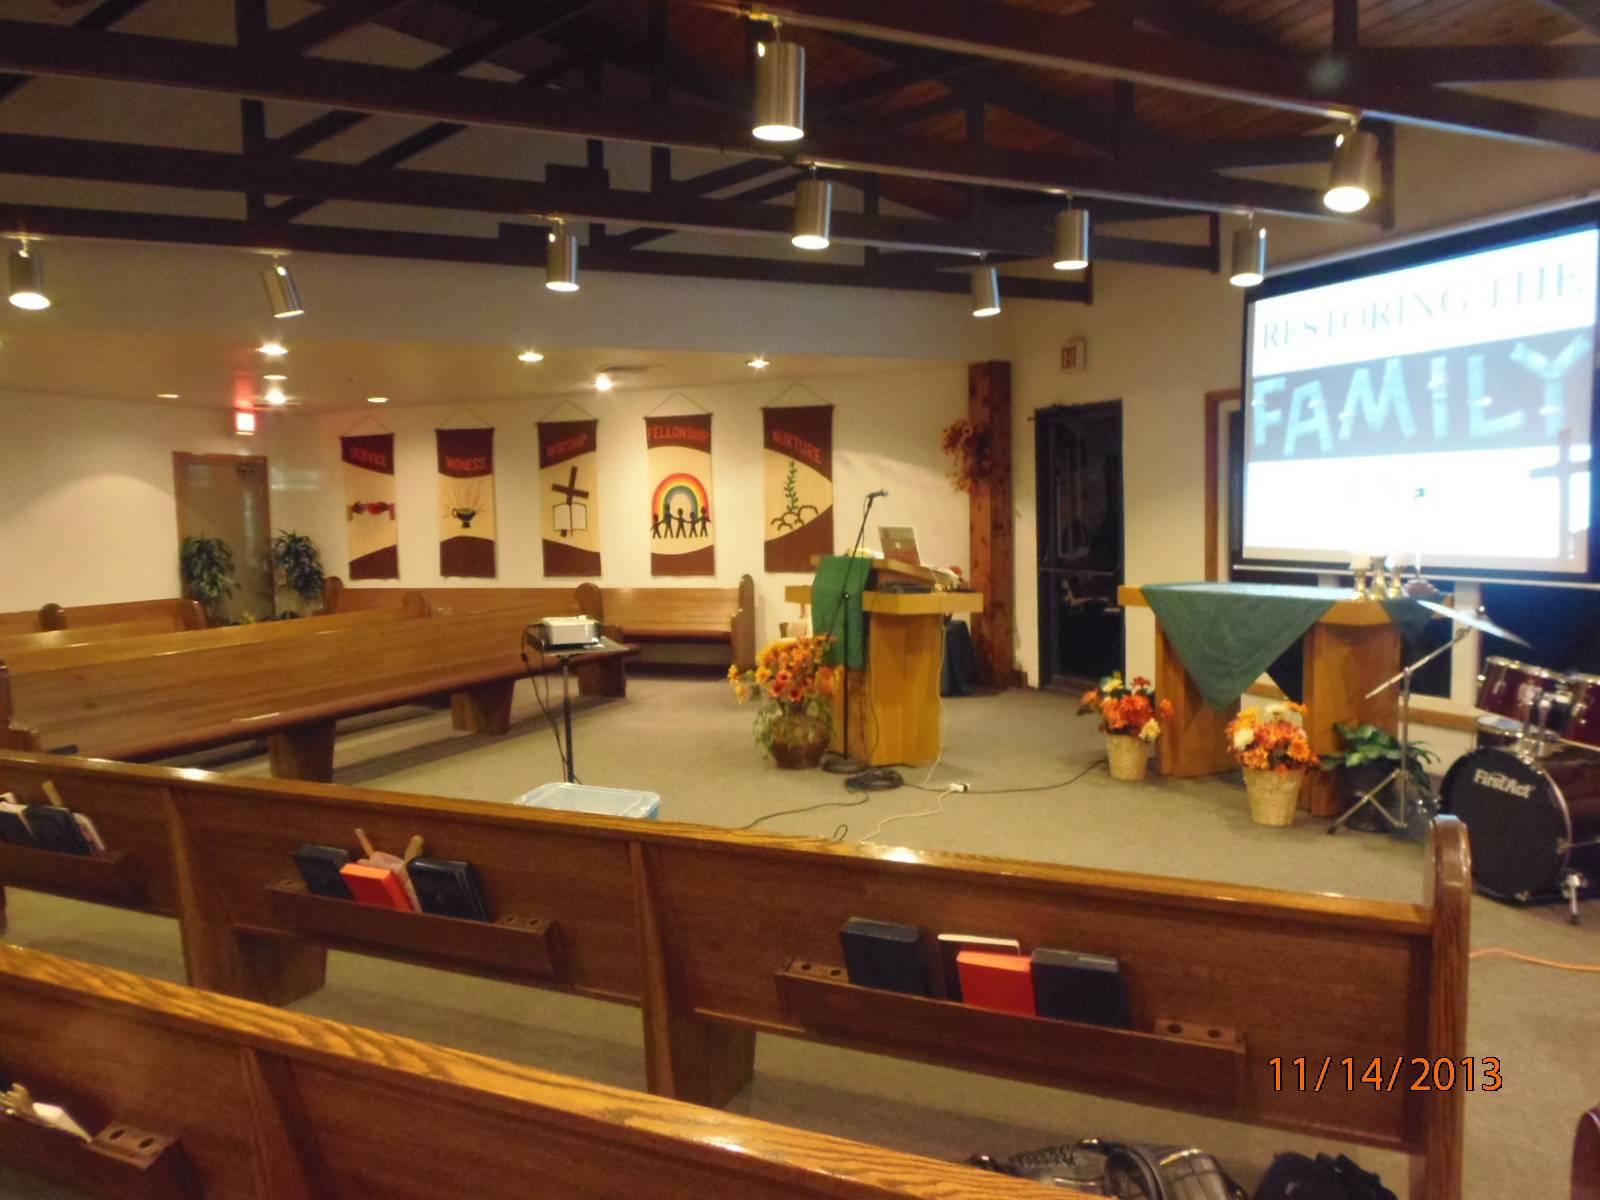 Restoring the Family Unit Workshop